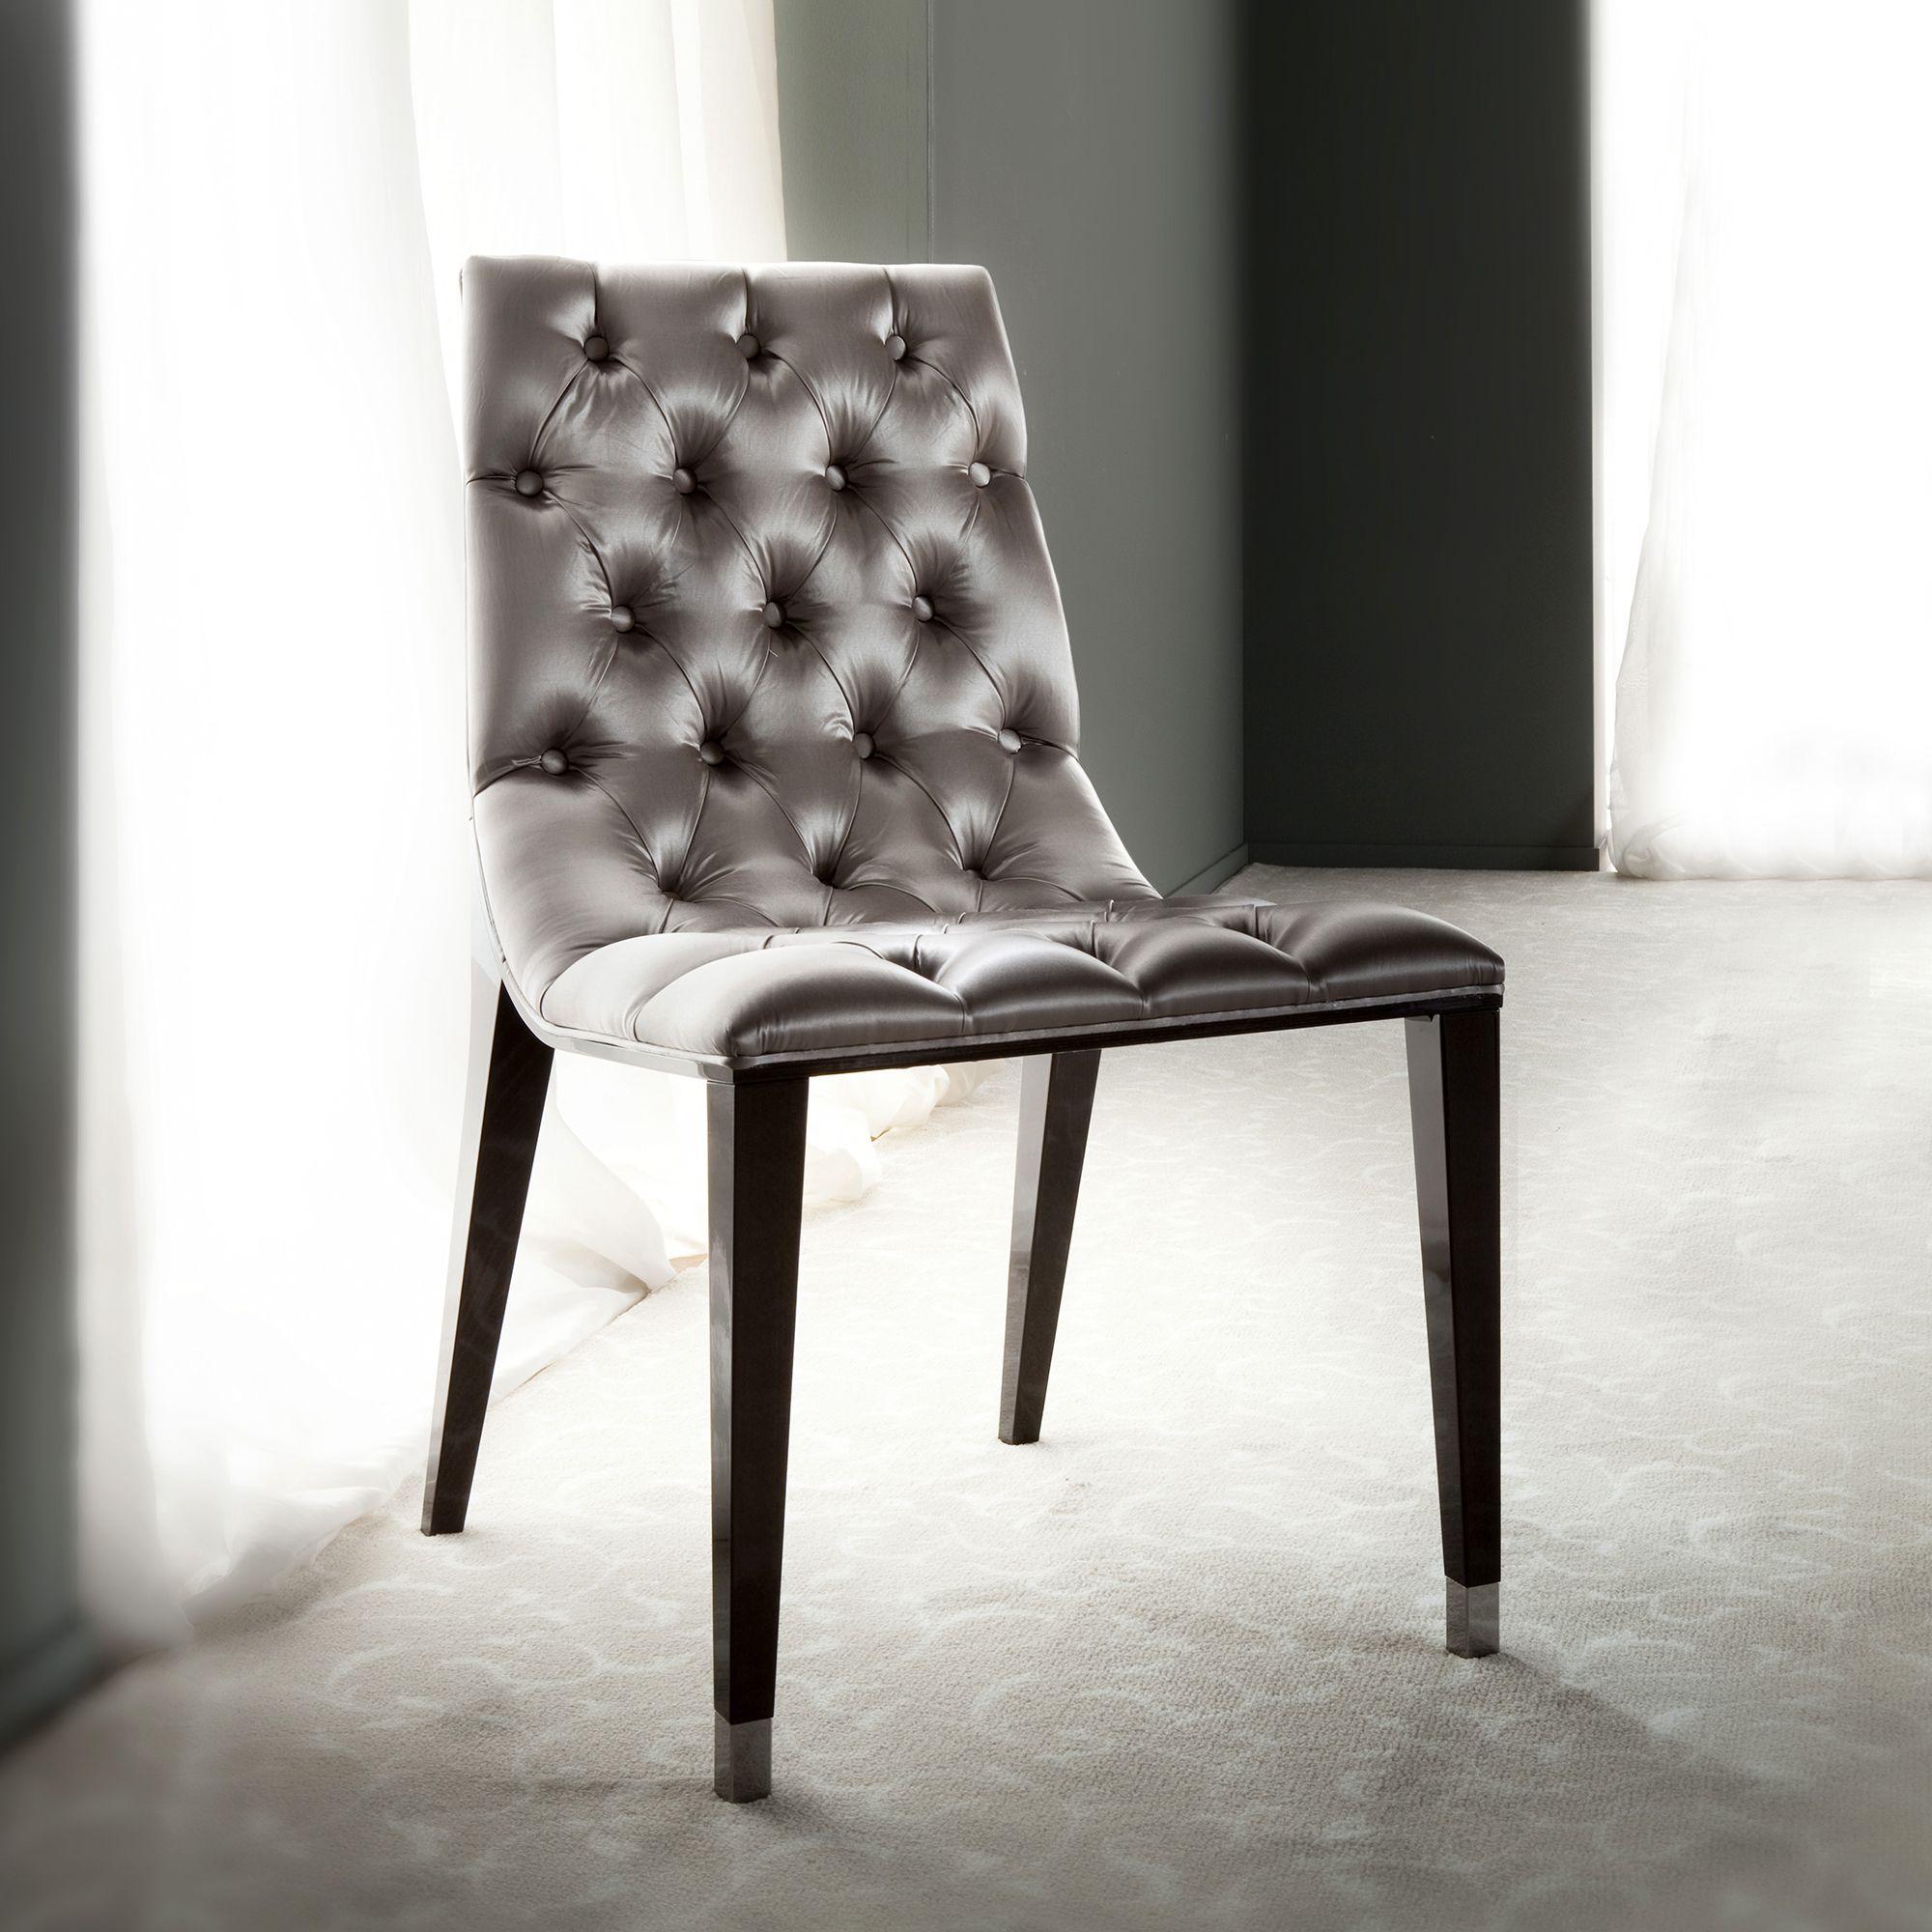 Luxury Italian Upholstered Club Chair Italian Designer Luxury Furniture At Cassoni Com Club Chairs Luxury Italian Furniture Chair